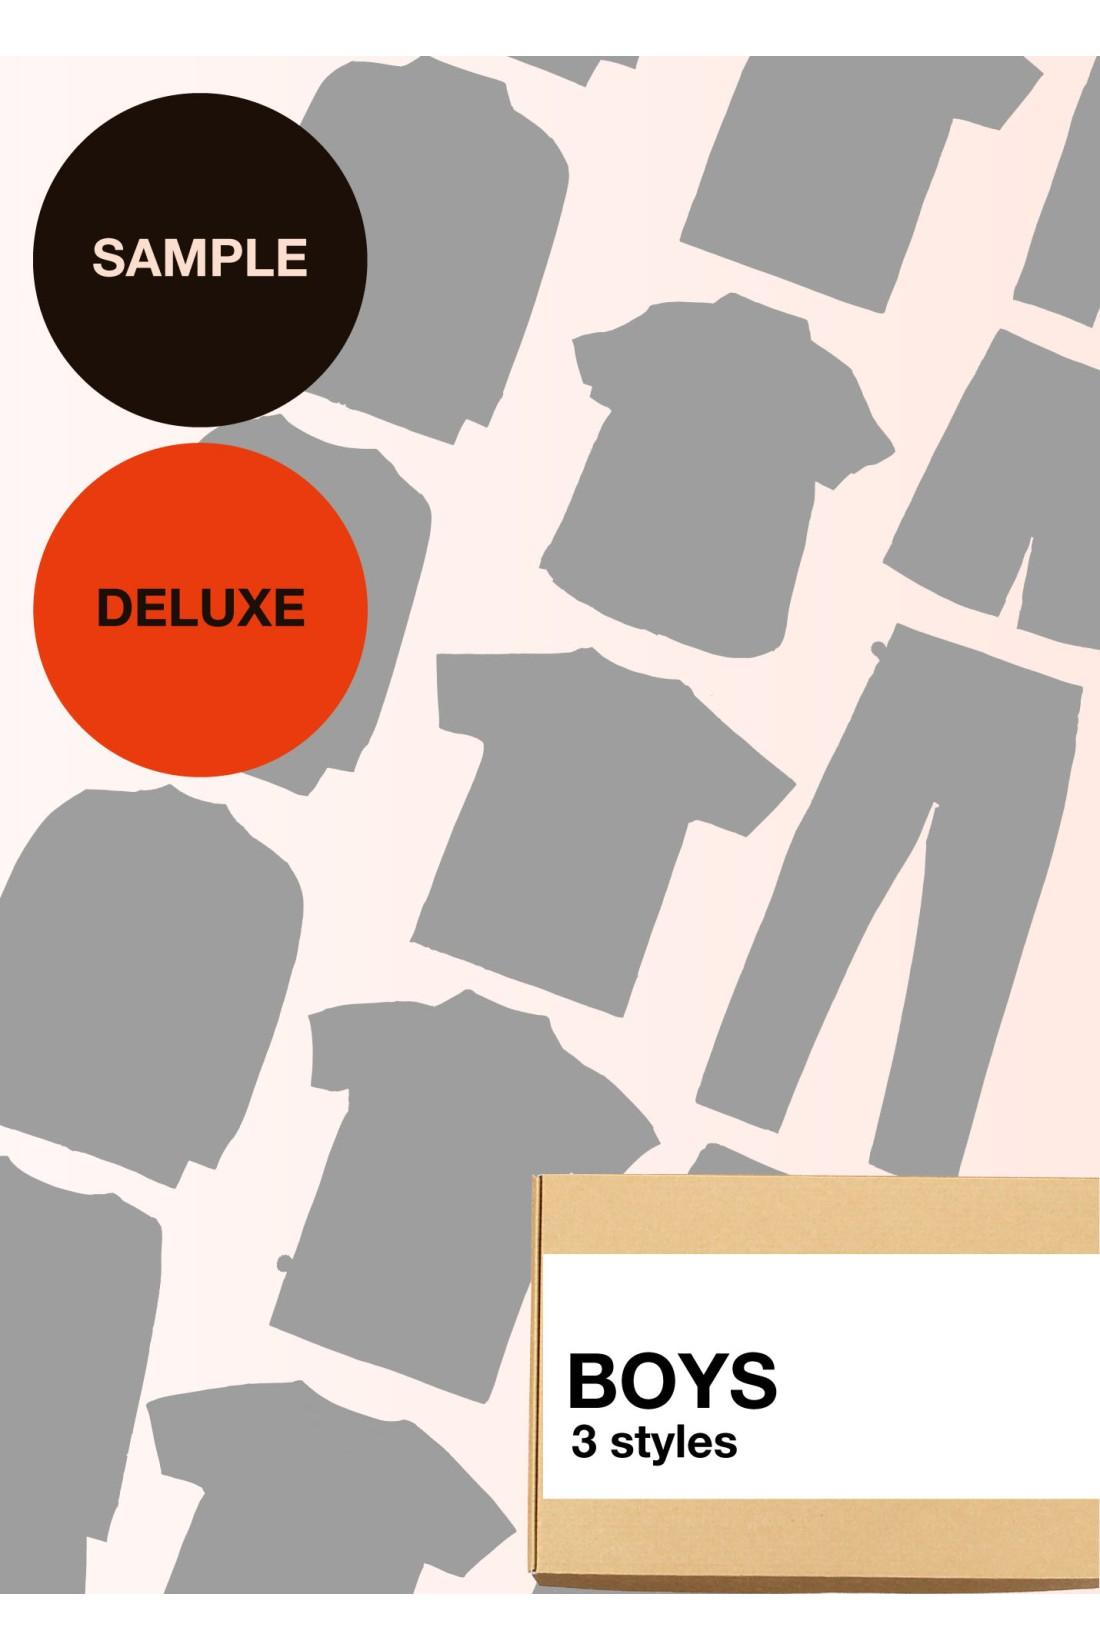 Sample Surprise Box Boys Deluxe - 3 Styles